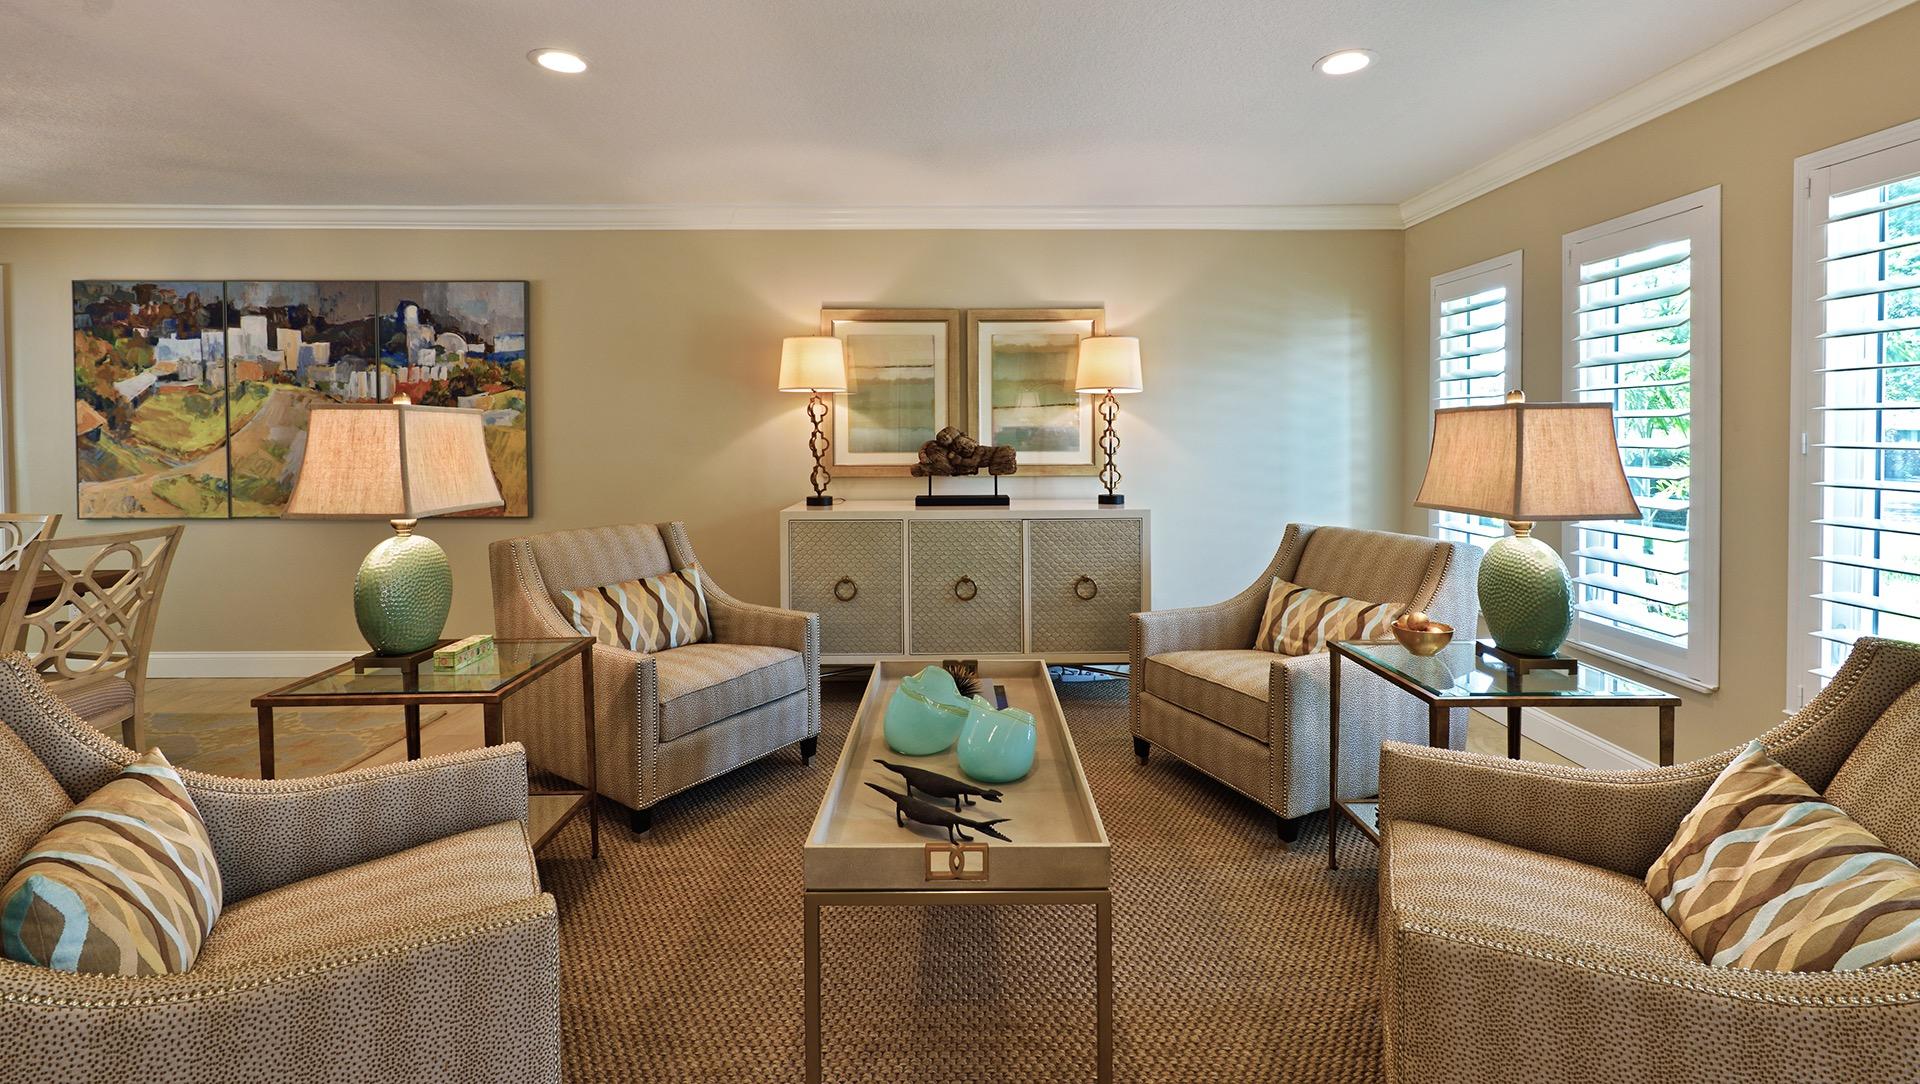 Tips while opting for living room flooring ideas custom for Brown carpet living room ideas